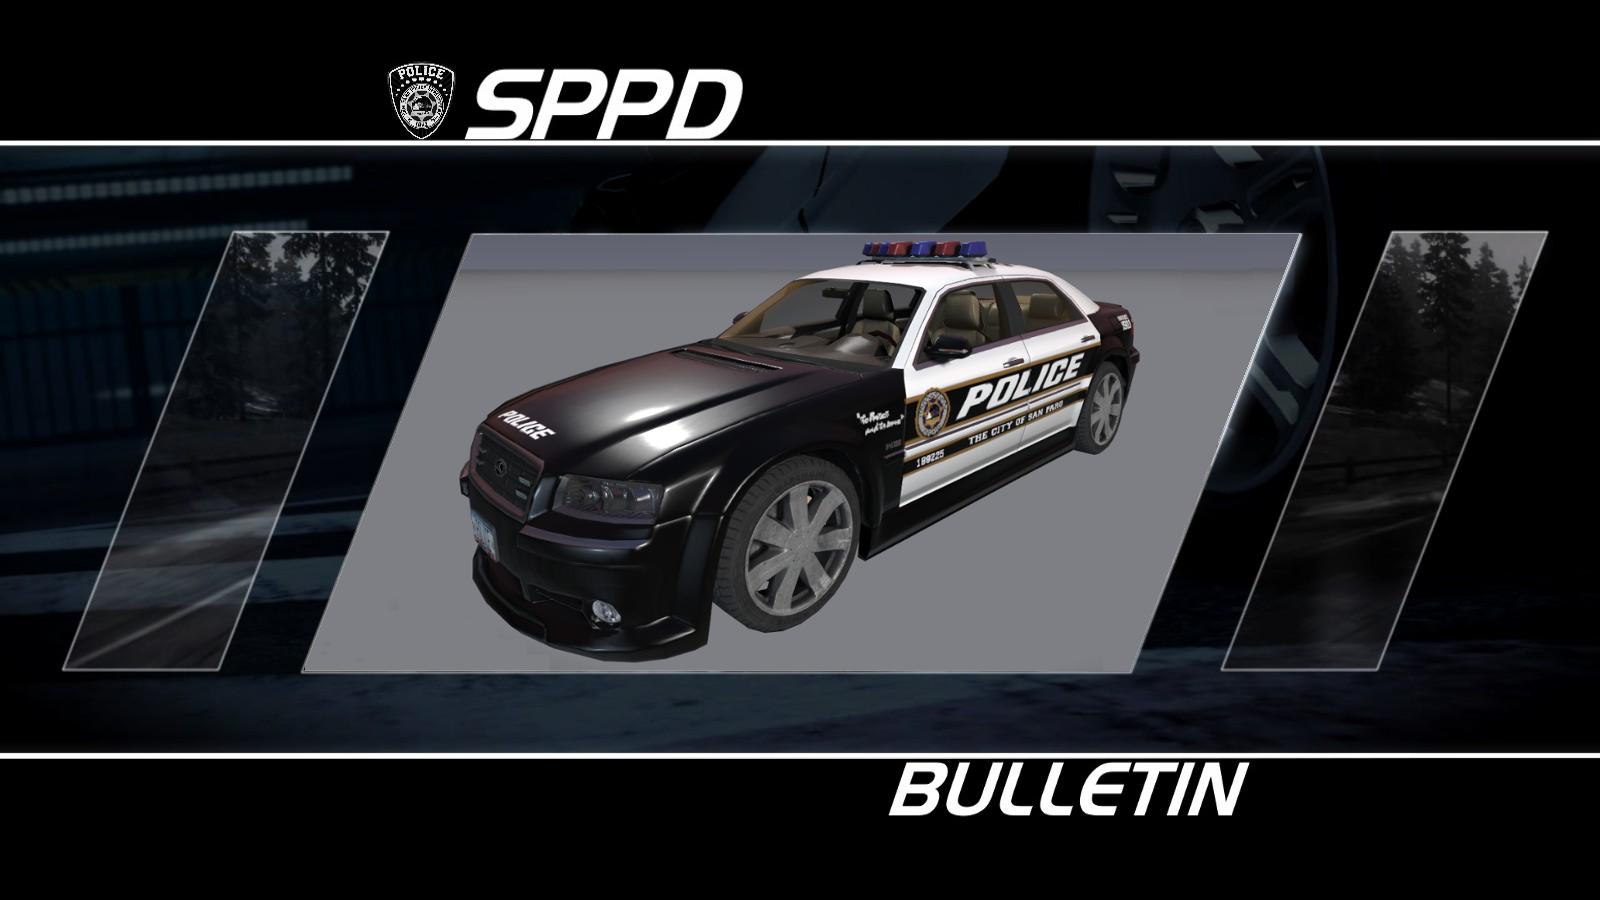 Police_Moirai_Bulletin.png